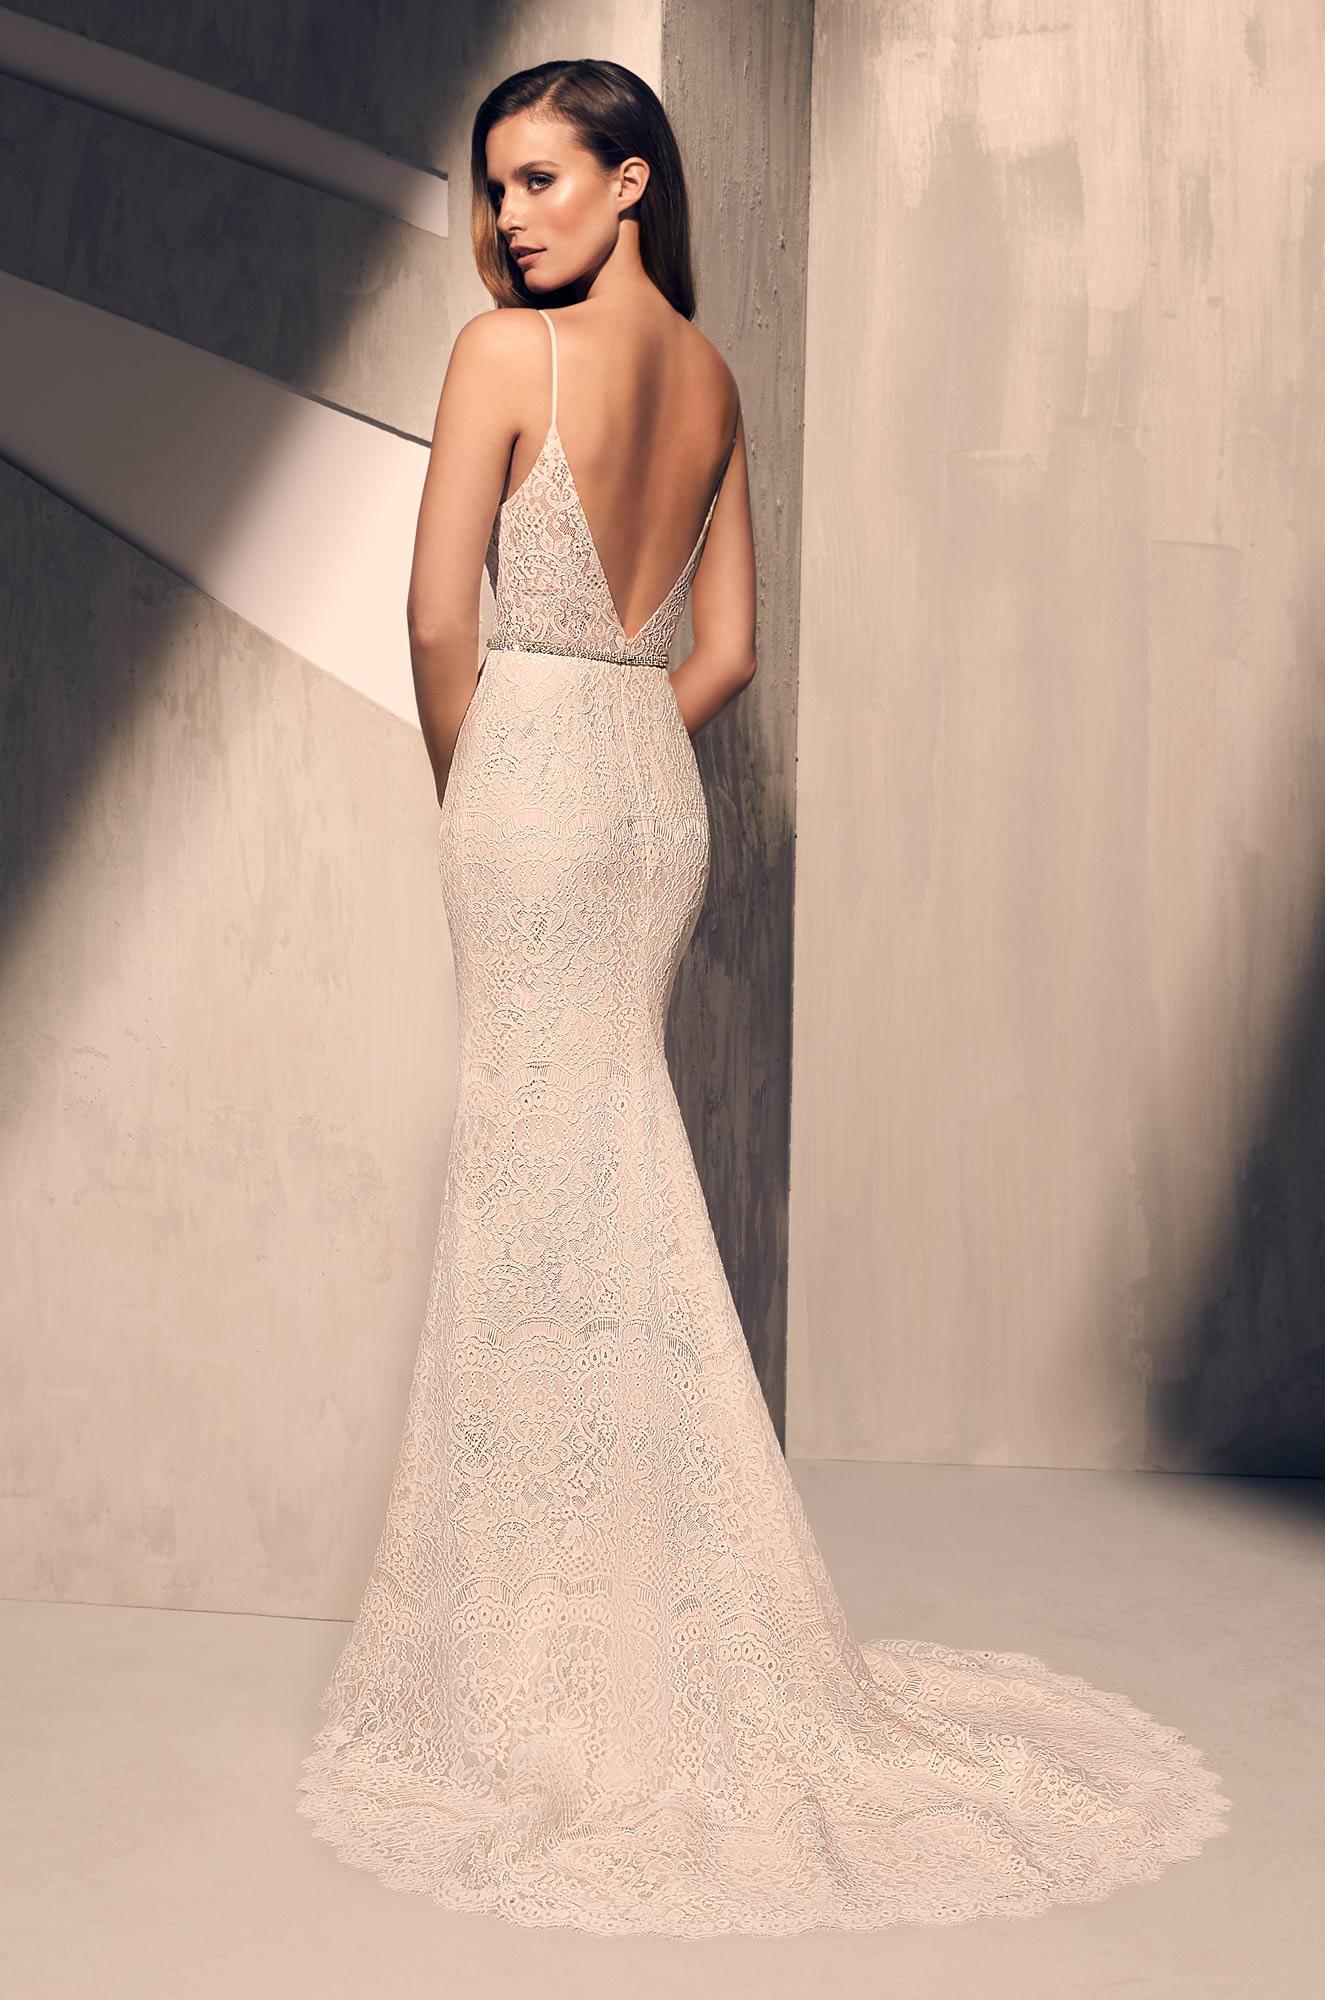 Ornate Lace Wedding Dress - Style #2215 | Mikaella Bridal